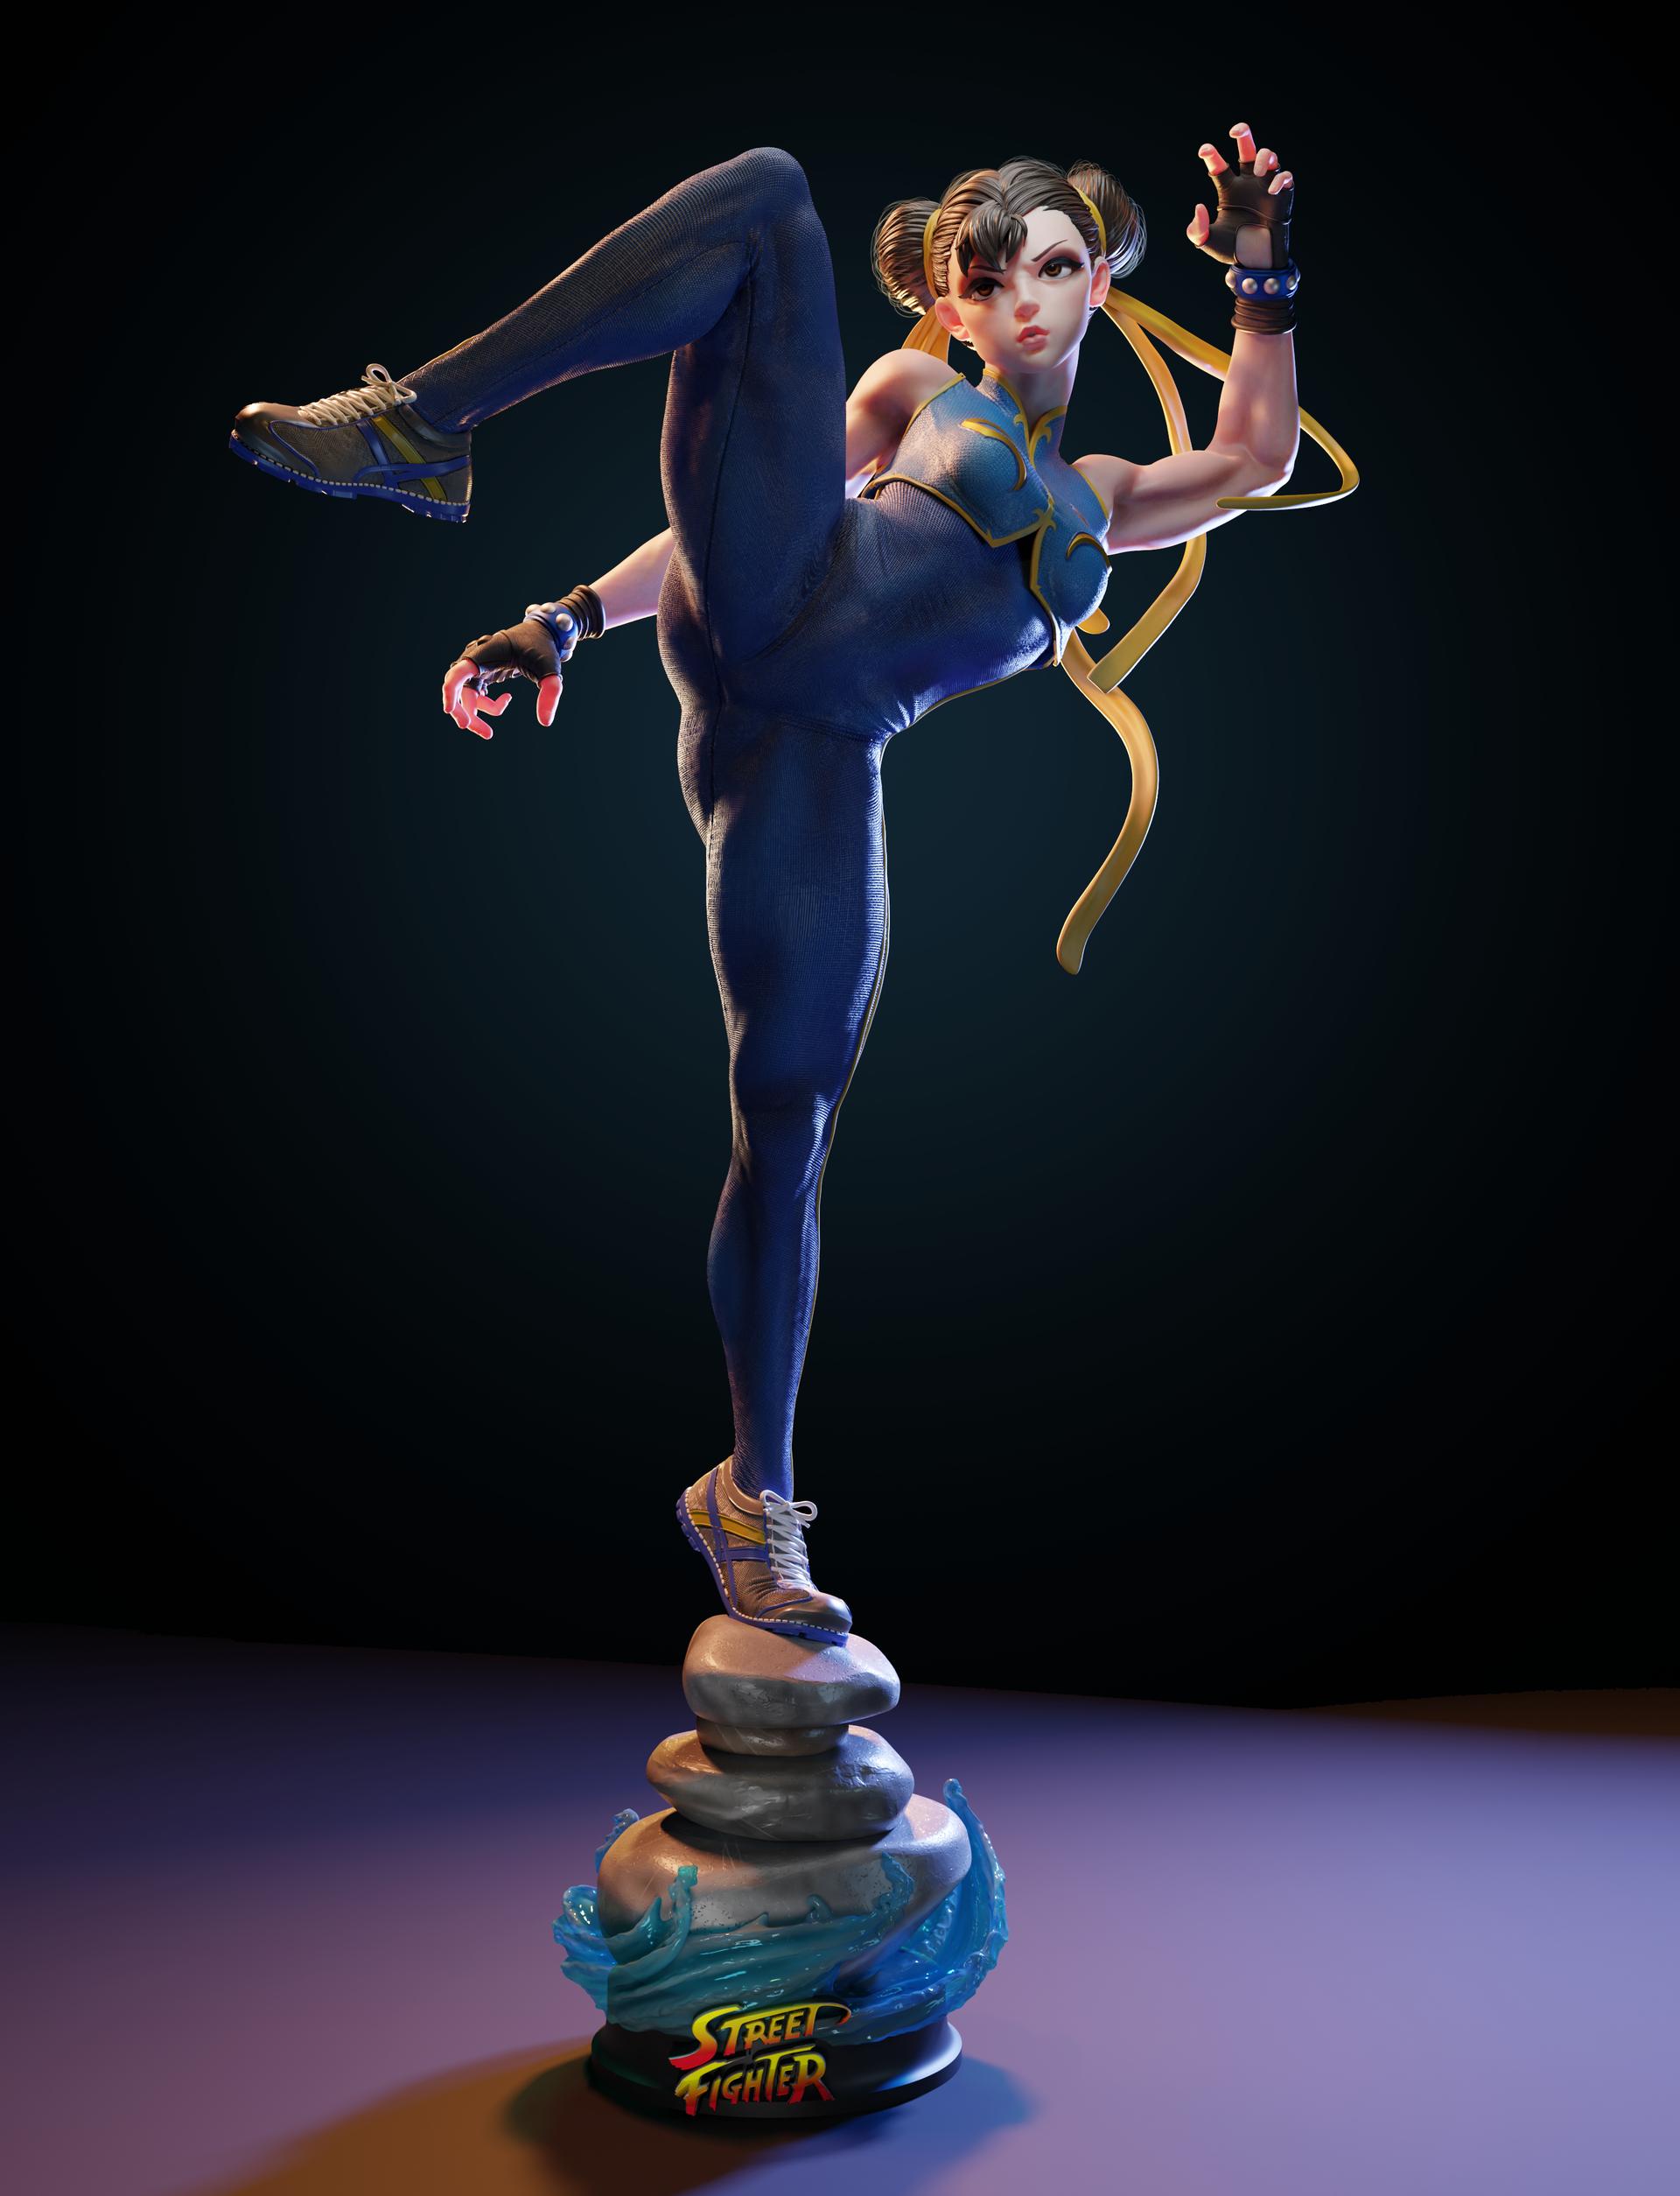 General 1920x2509 Chun-Li digital art video games video game girls video game warriors simple background Street Fighter muscular legs women